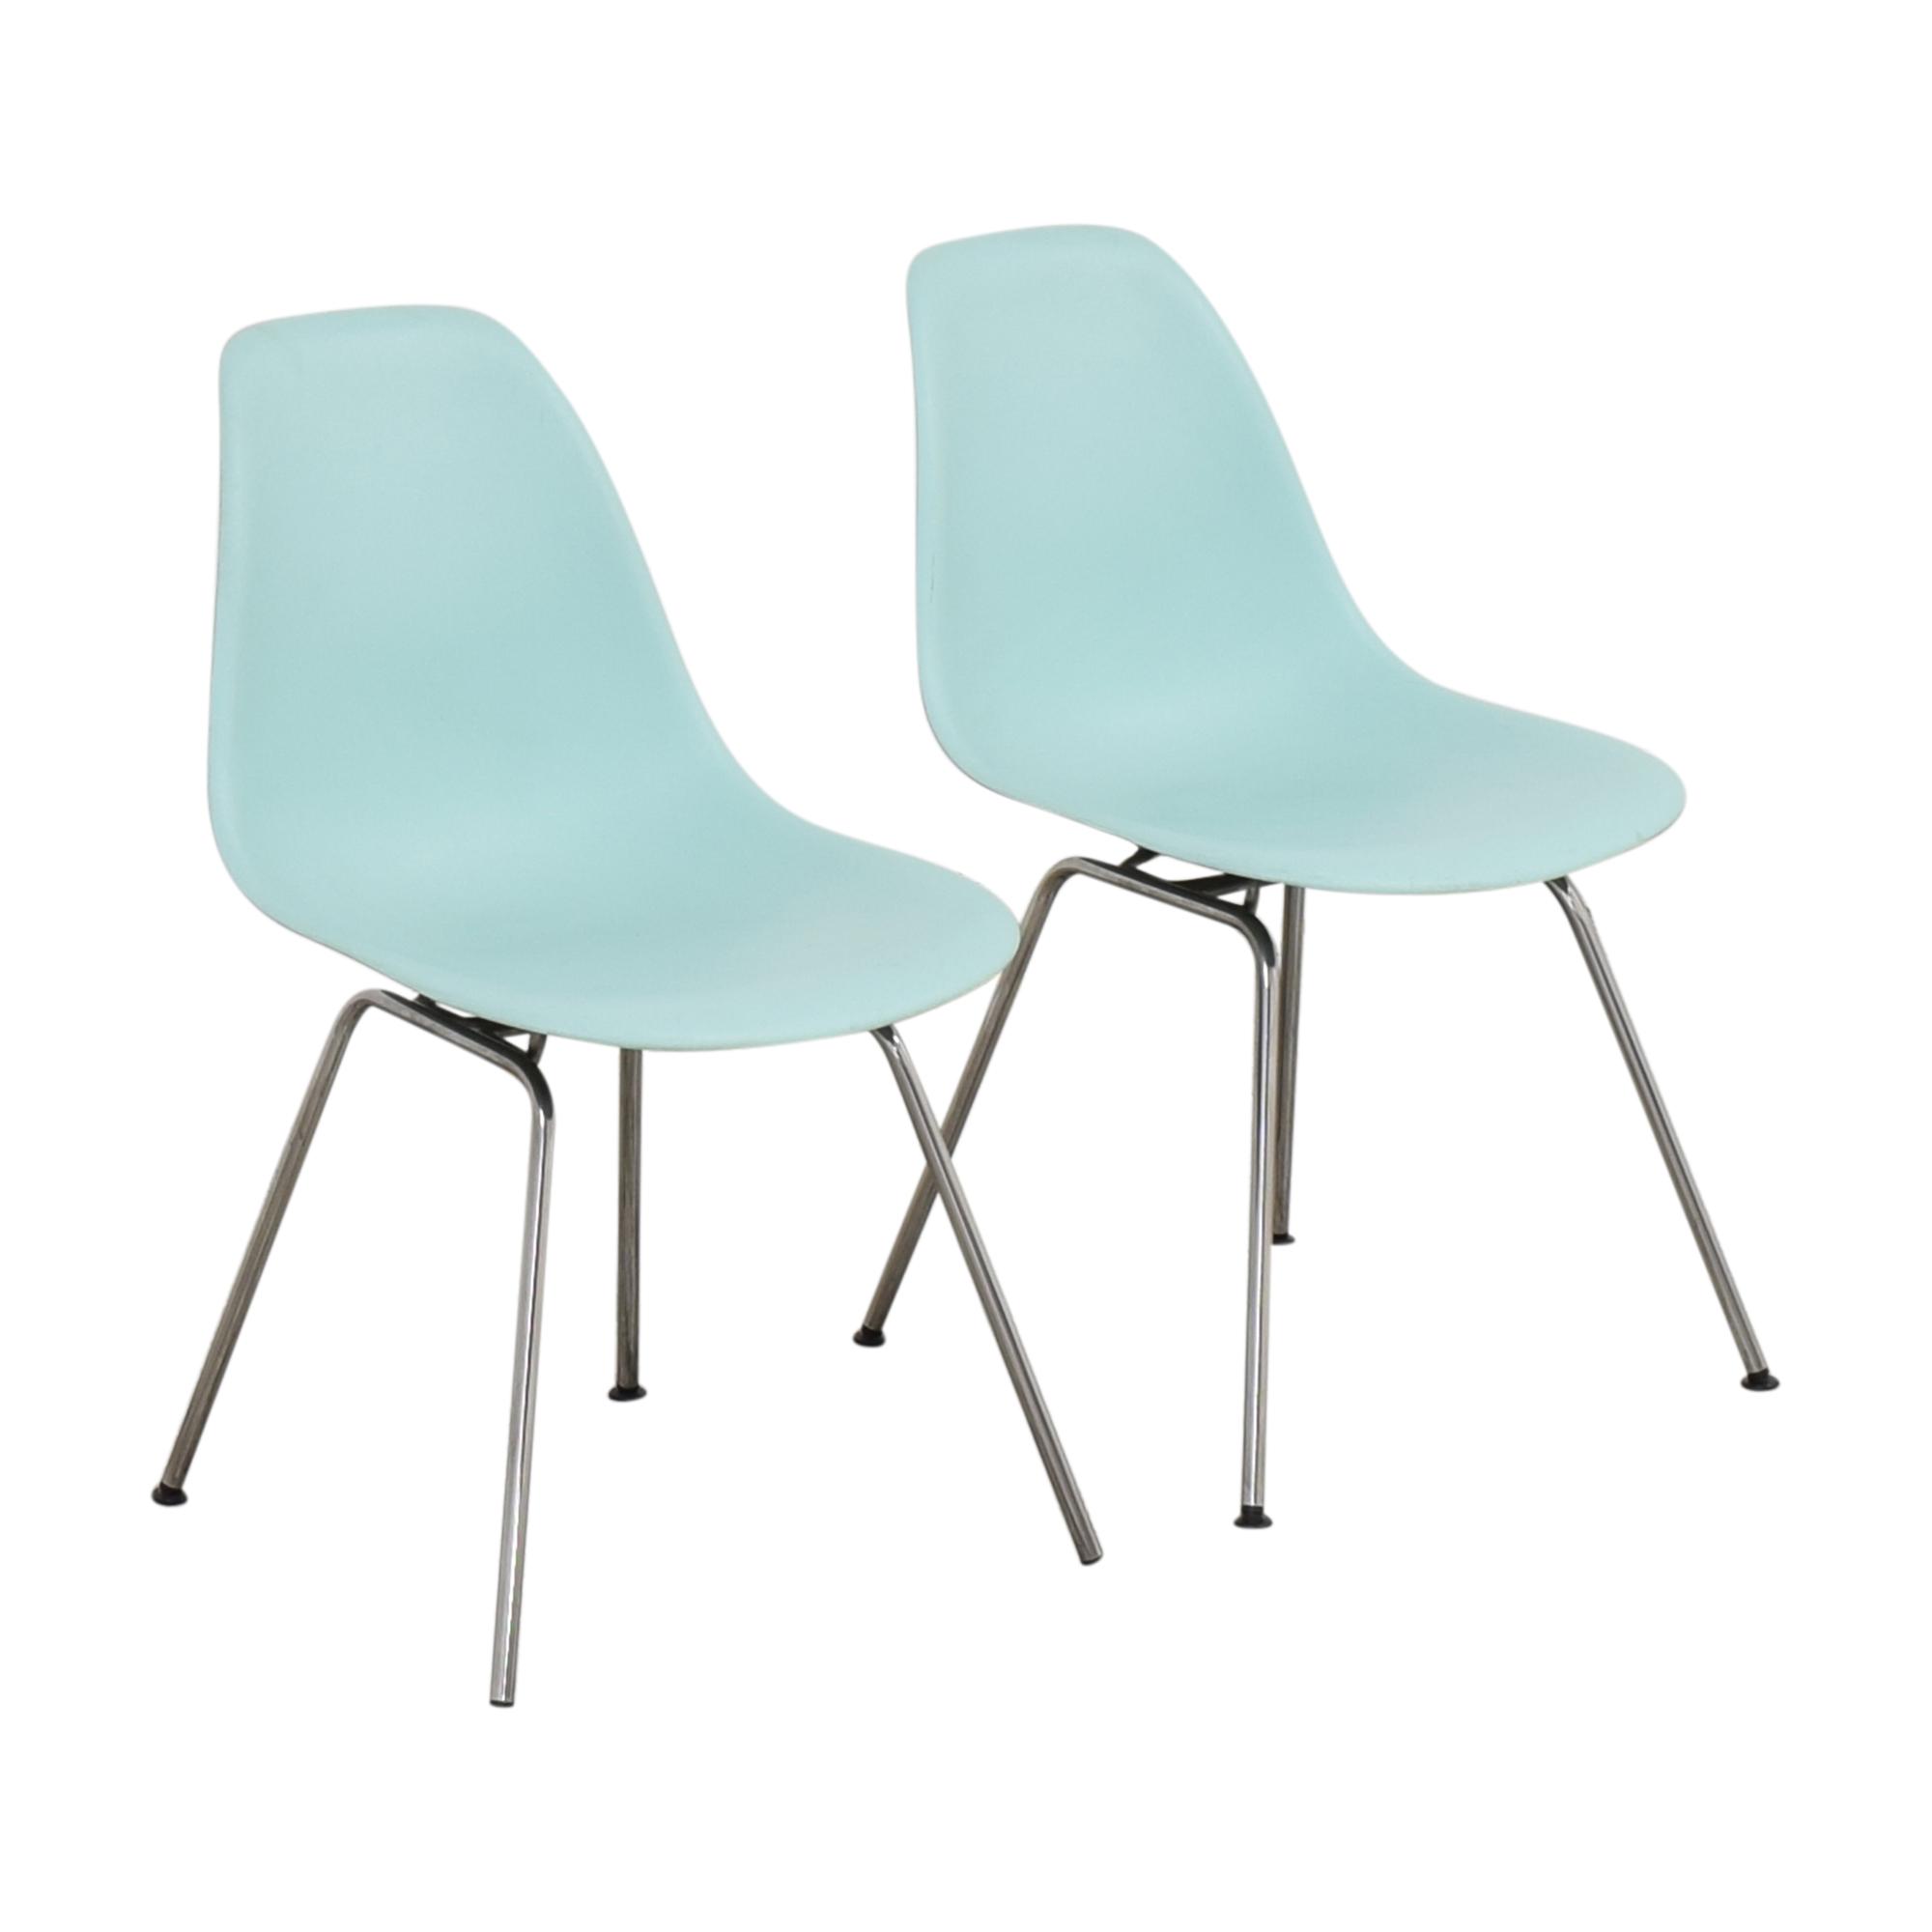 Herman Miller Herman Miller Eames Molded Side Chair, 4-Leg Base coupon